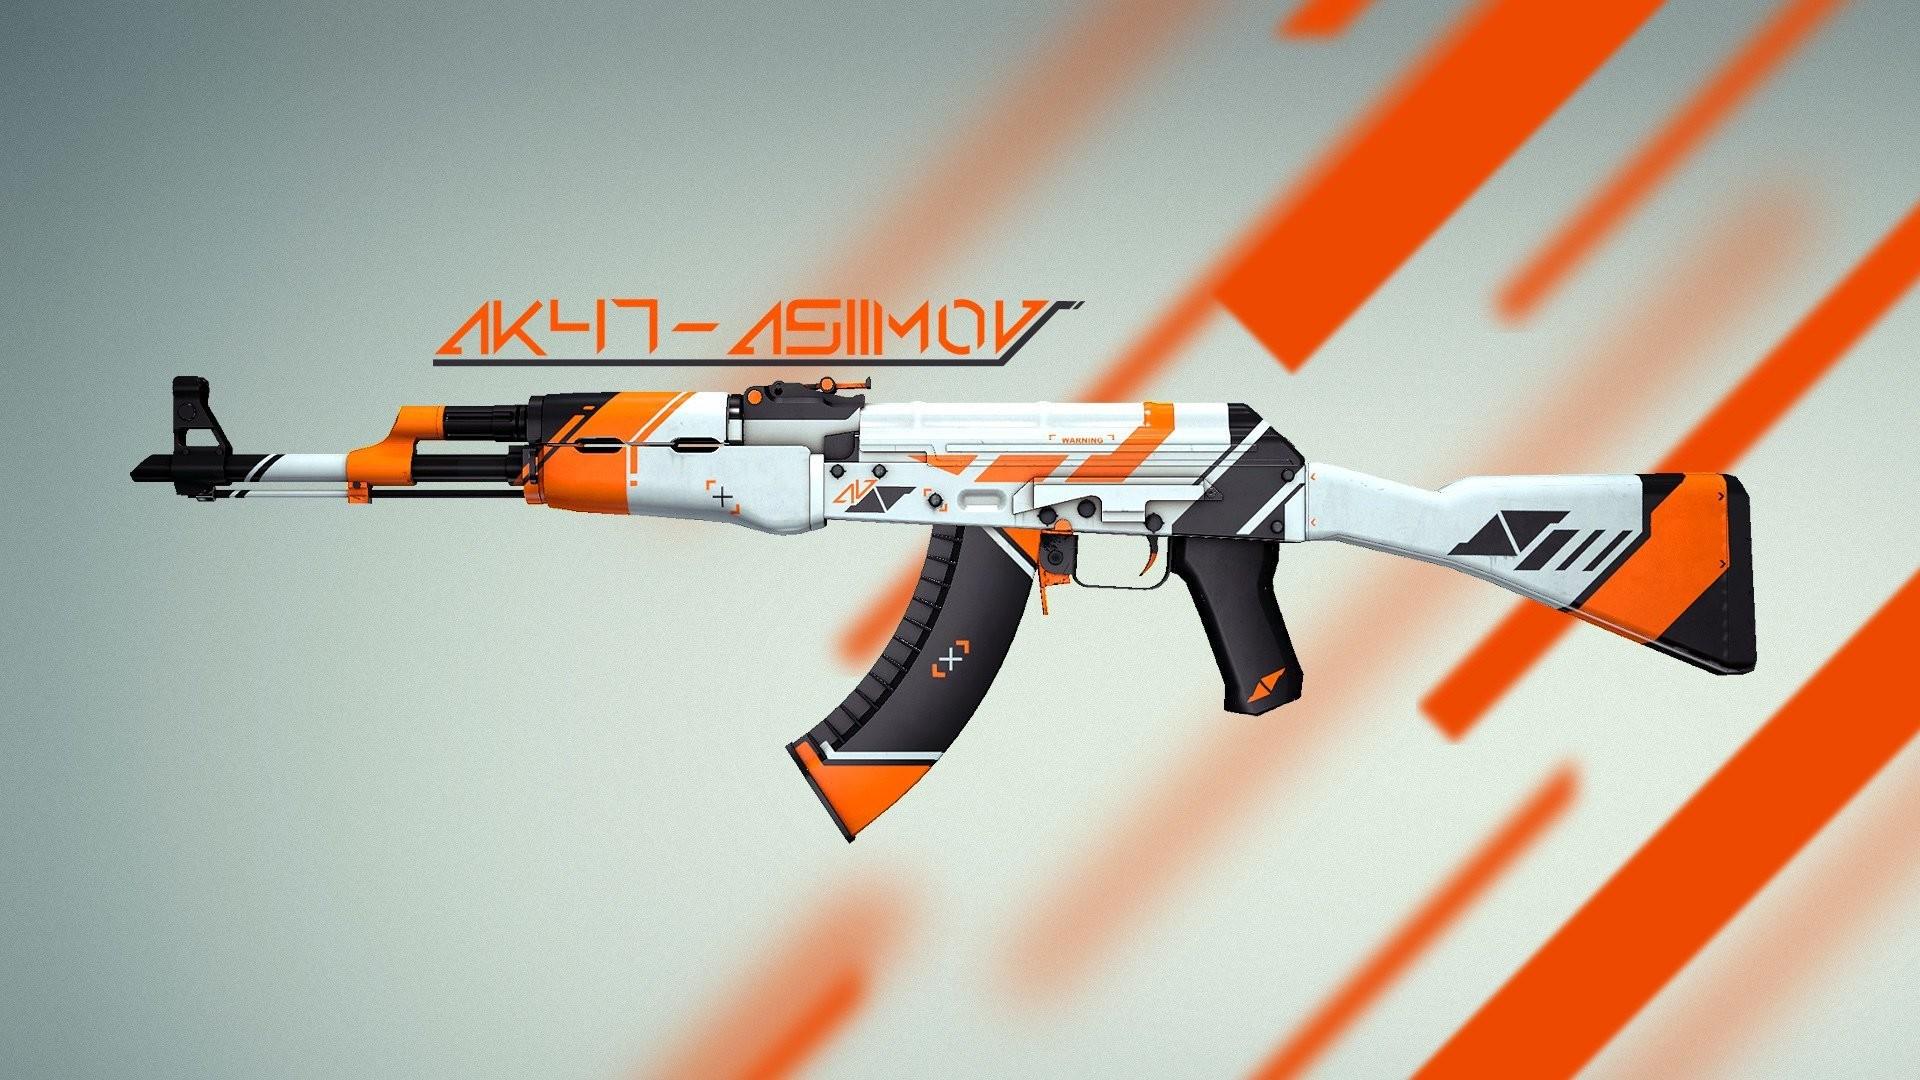 ak-47|asiimov asiimov coridium cs:go counter strike global offensive skin  weapon